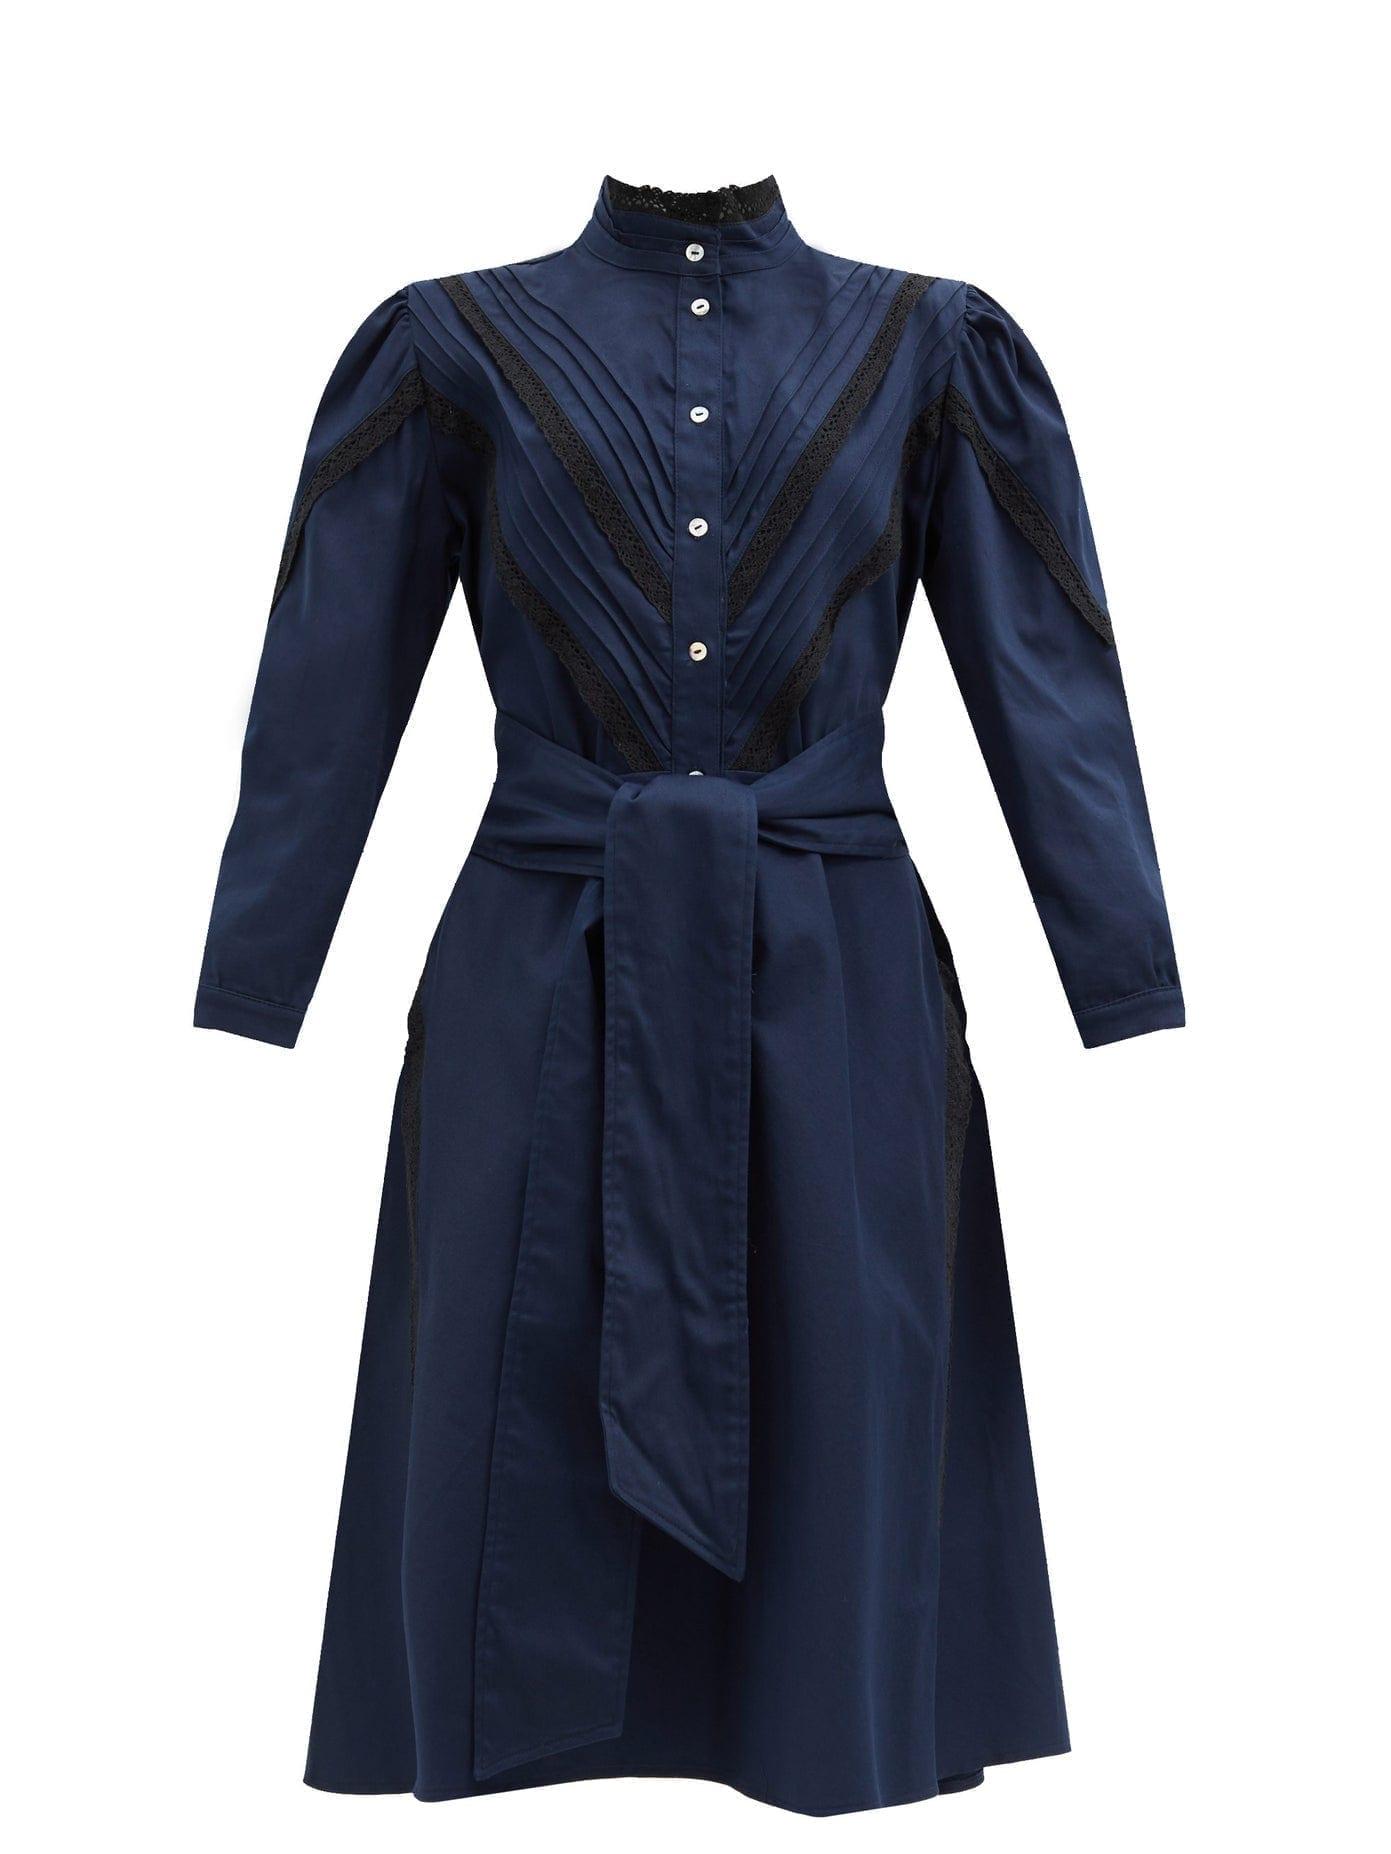 ÀCHEVAL PAMPA Yegua Cotton-blend Crepe Shirt Dress